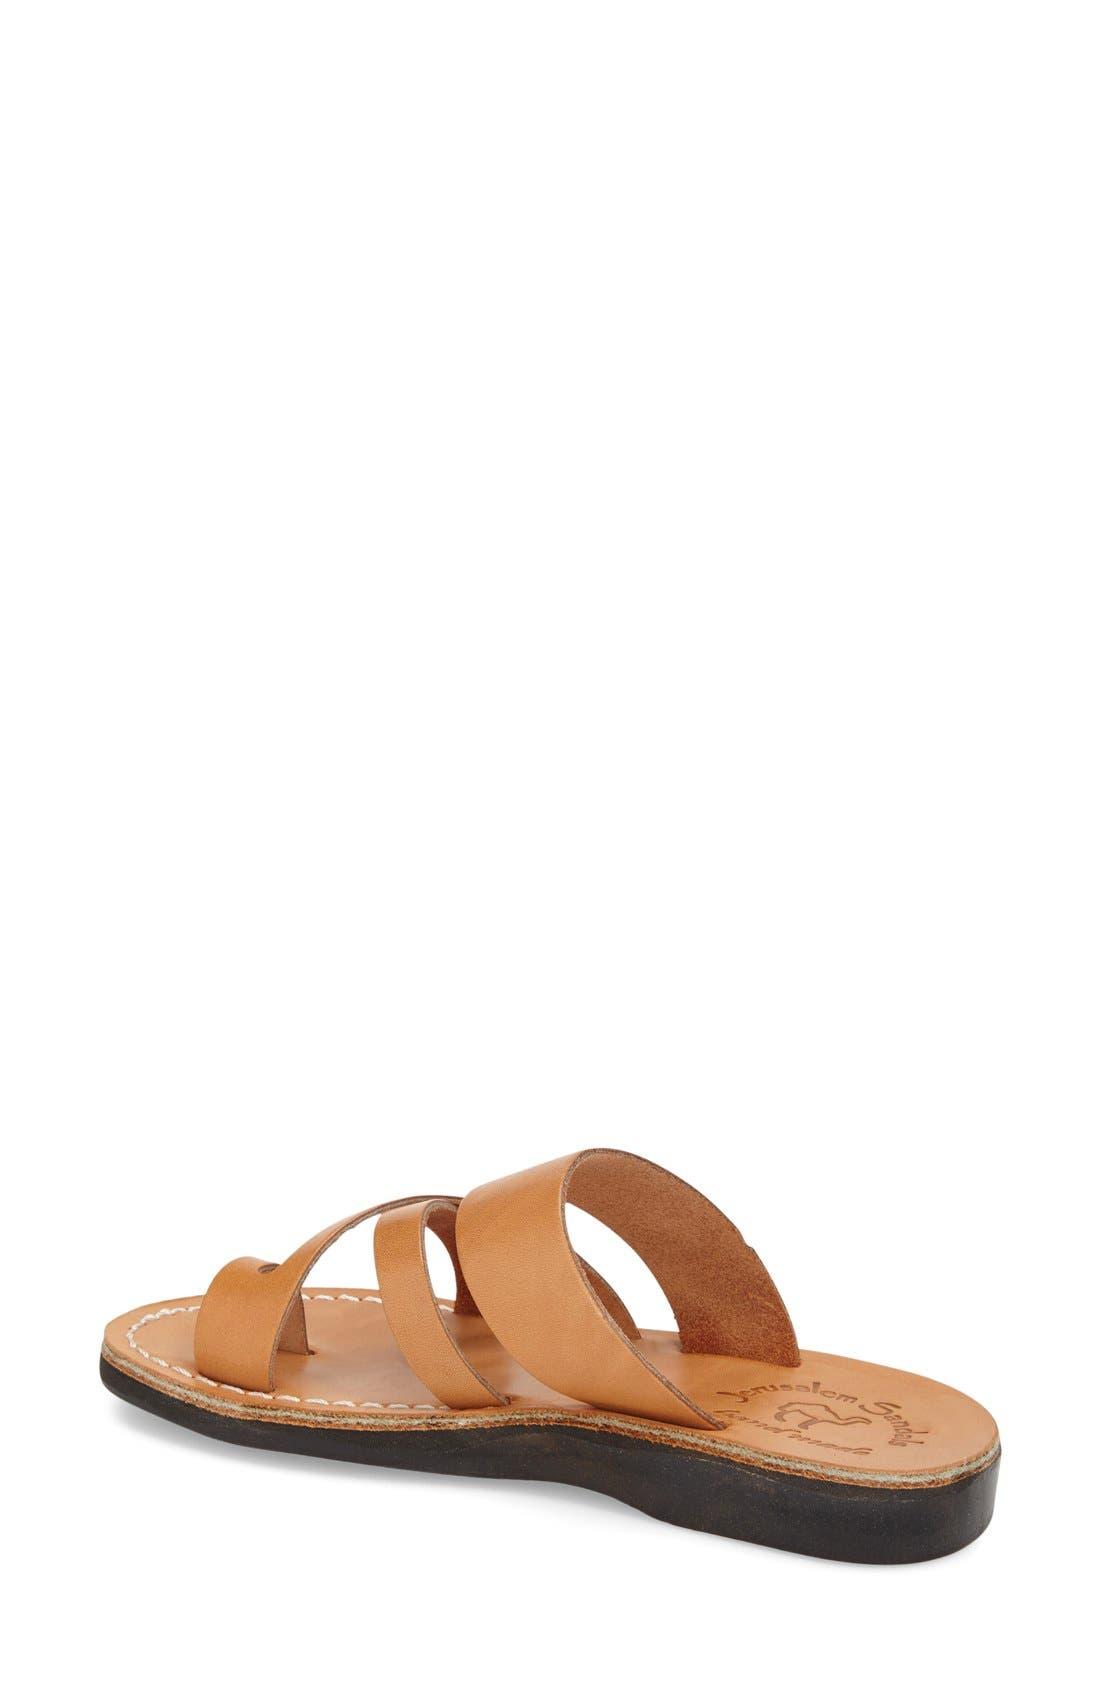 Alternate Image 2  - Jerusalem Sandals 'The Good Shepard' Leather Sandal (Women)